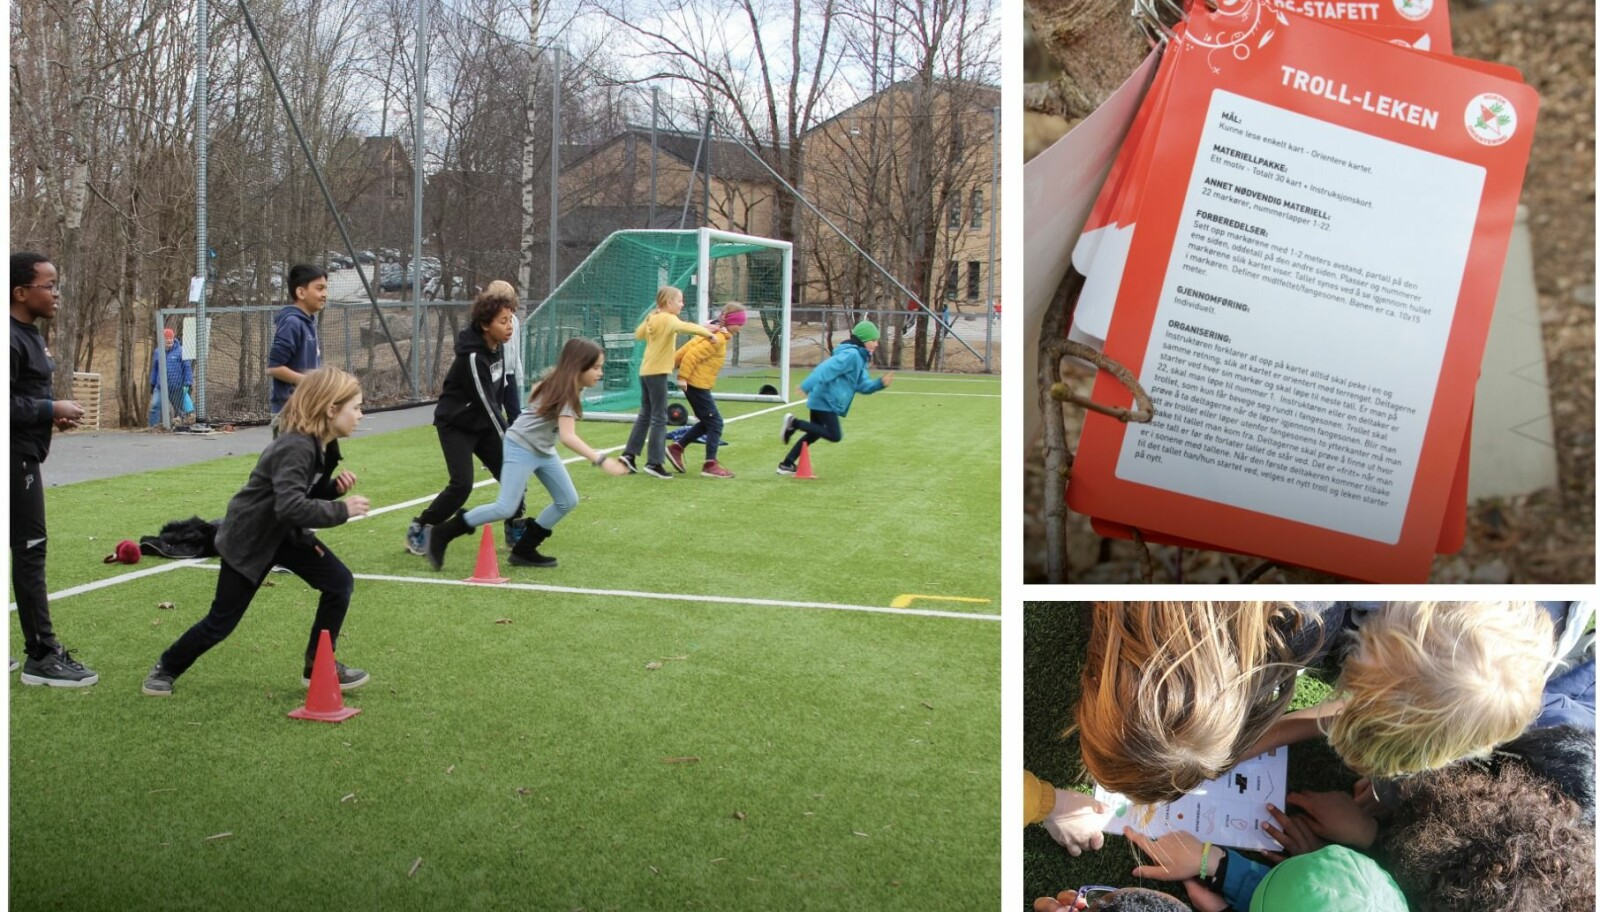 Norges Orienteringsforbund sender skoler gratis poster og materiell. Orienterings-stafett på kunstgresset gir stor aktivitetsglede.